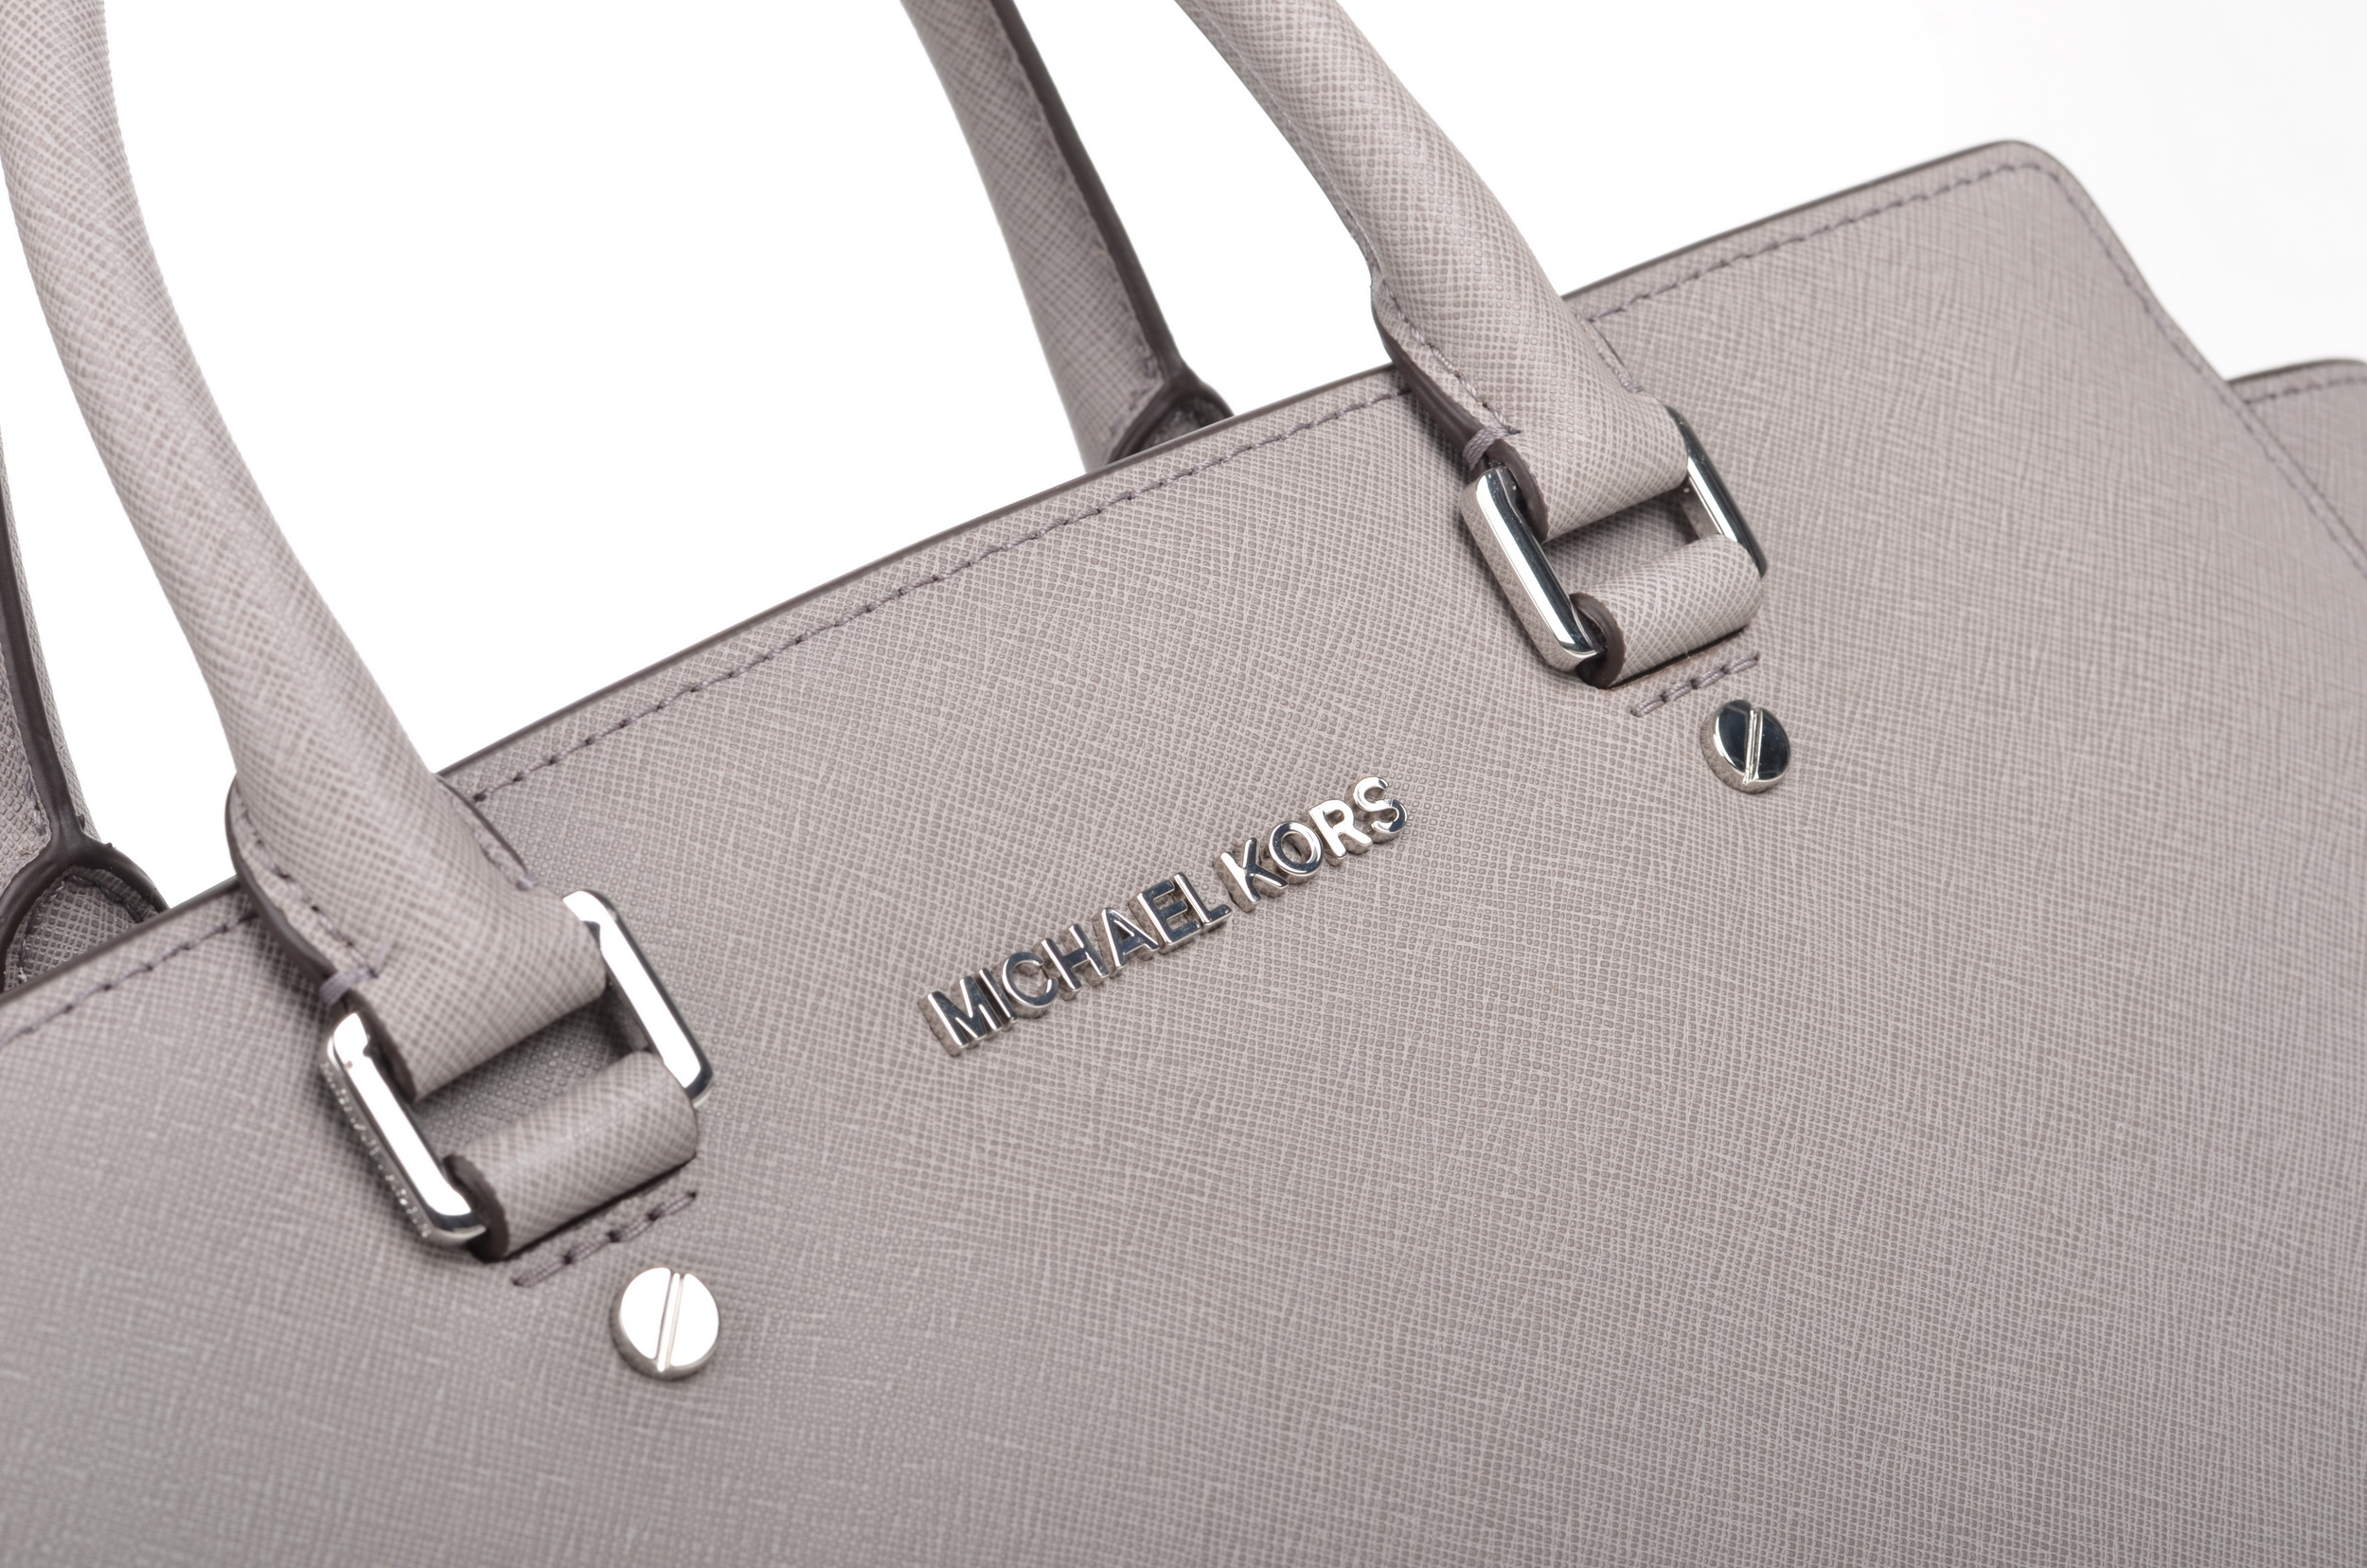 michael kors selma lg tz satchel silver mksale. Black Bedroom Furniture Sets. Home Design Ideas